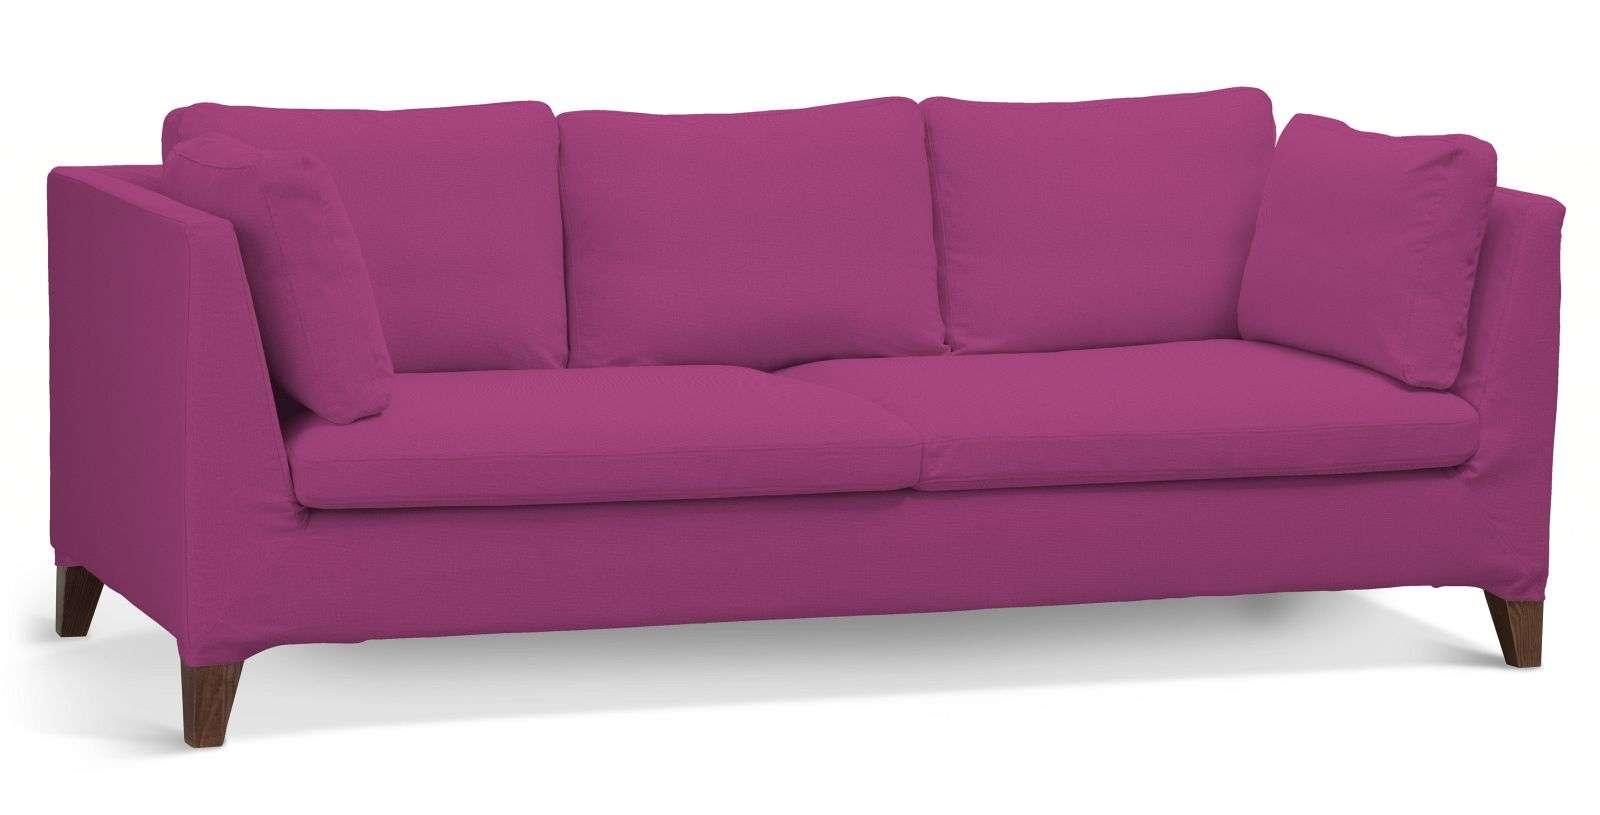 Užvalkalas IKEA trivietei sofai Stockholm  IKEA sofa Stockholm trivietė kolekcijoje Etna , audinys: 705-23